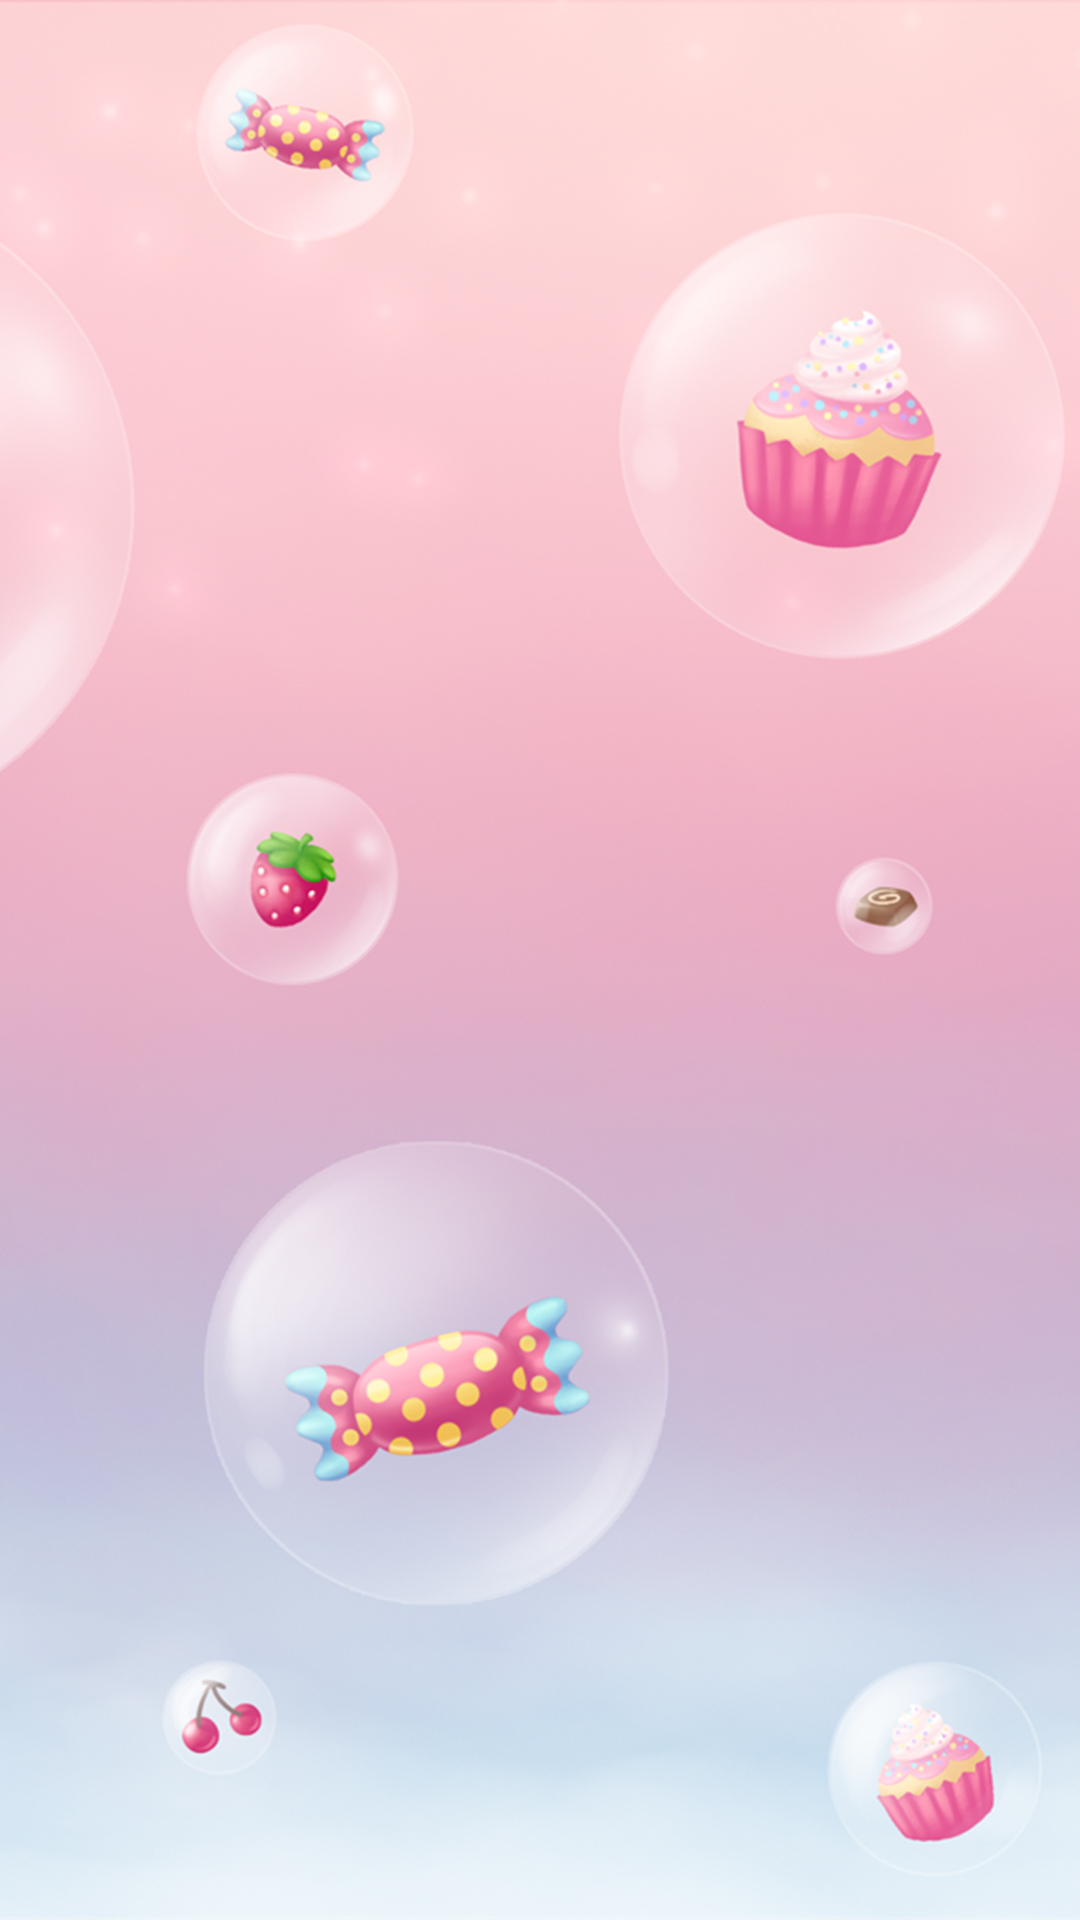 Cute Cake Hd Wallpaper Cool Pink Iphone Wallpapers Hd Pixelstalk Net